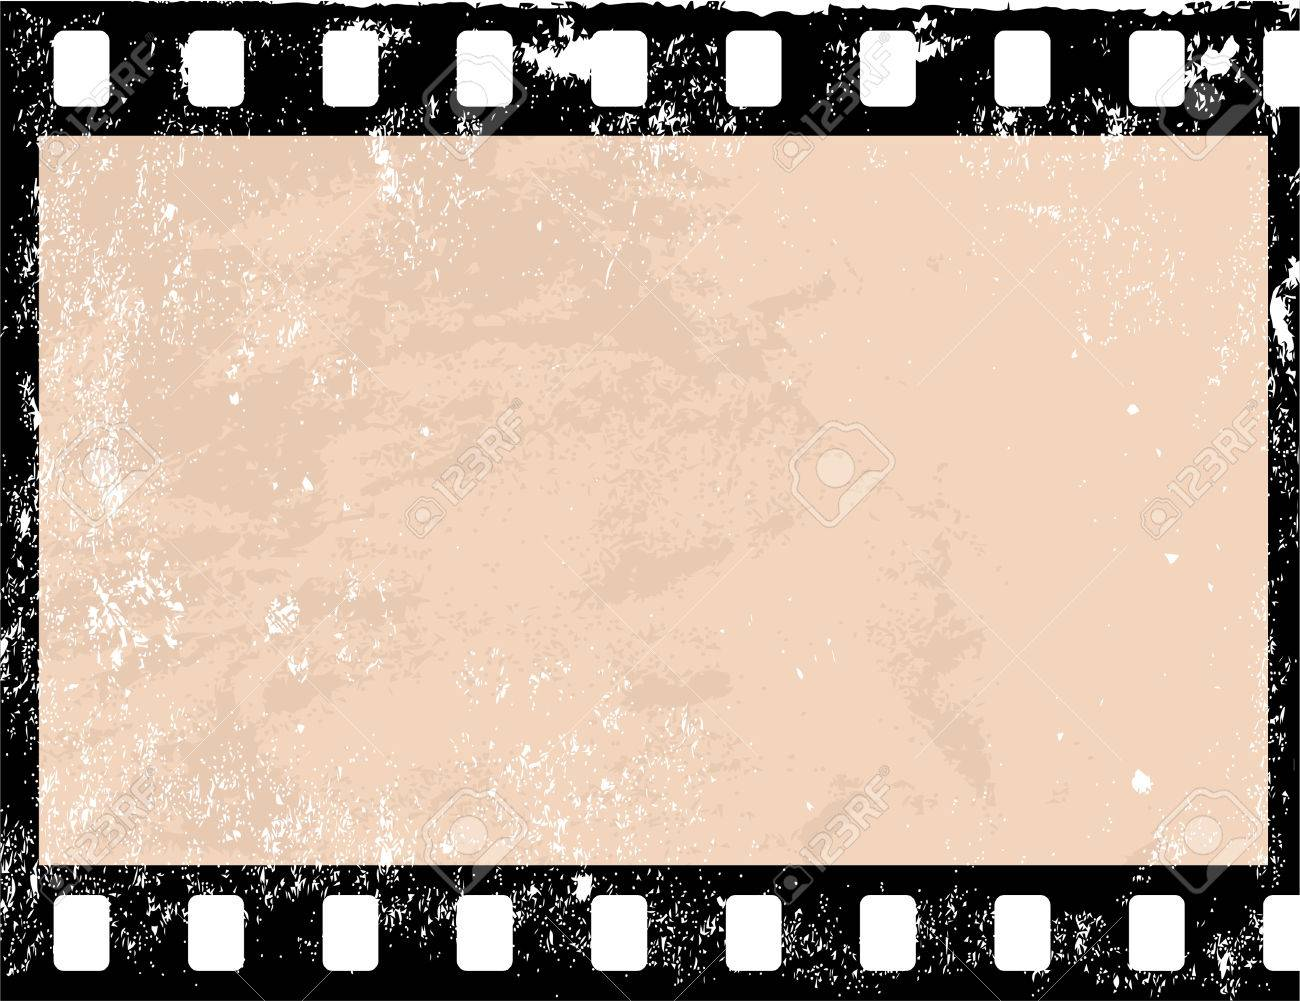 Grunge Camera Vector : Illustration of a grunge filmstrip frame royalty free cliparts